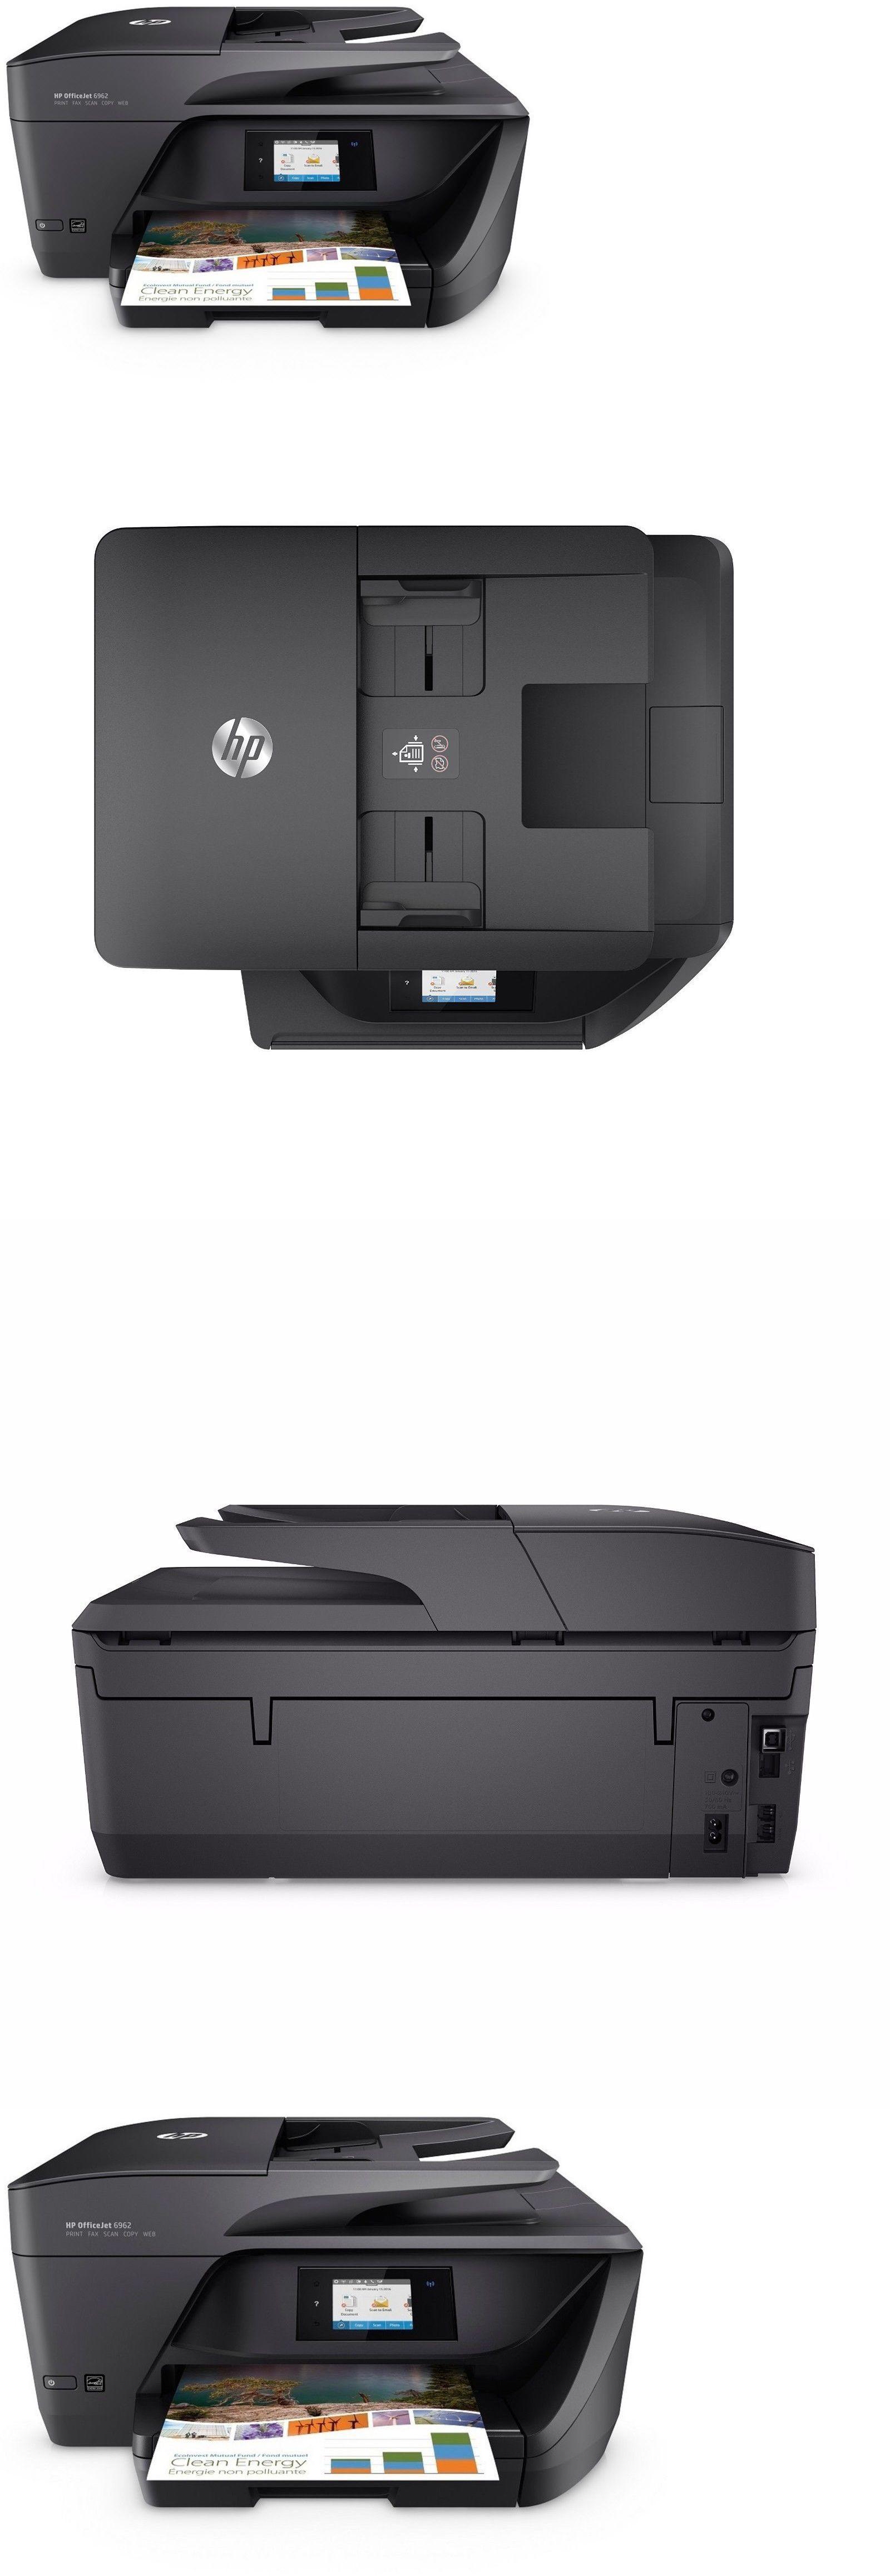 Printers 1245 Hp Officejet Pro 6962 AllInOne Printer